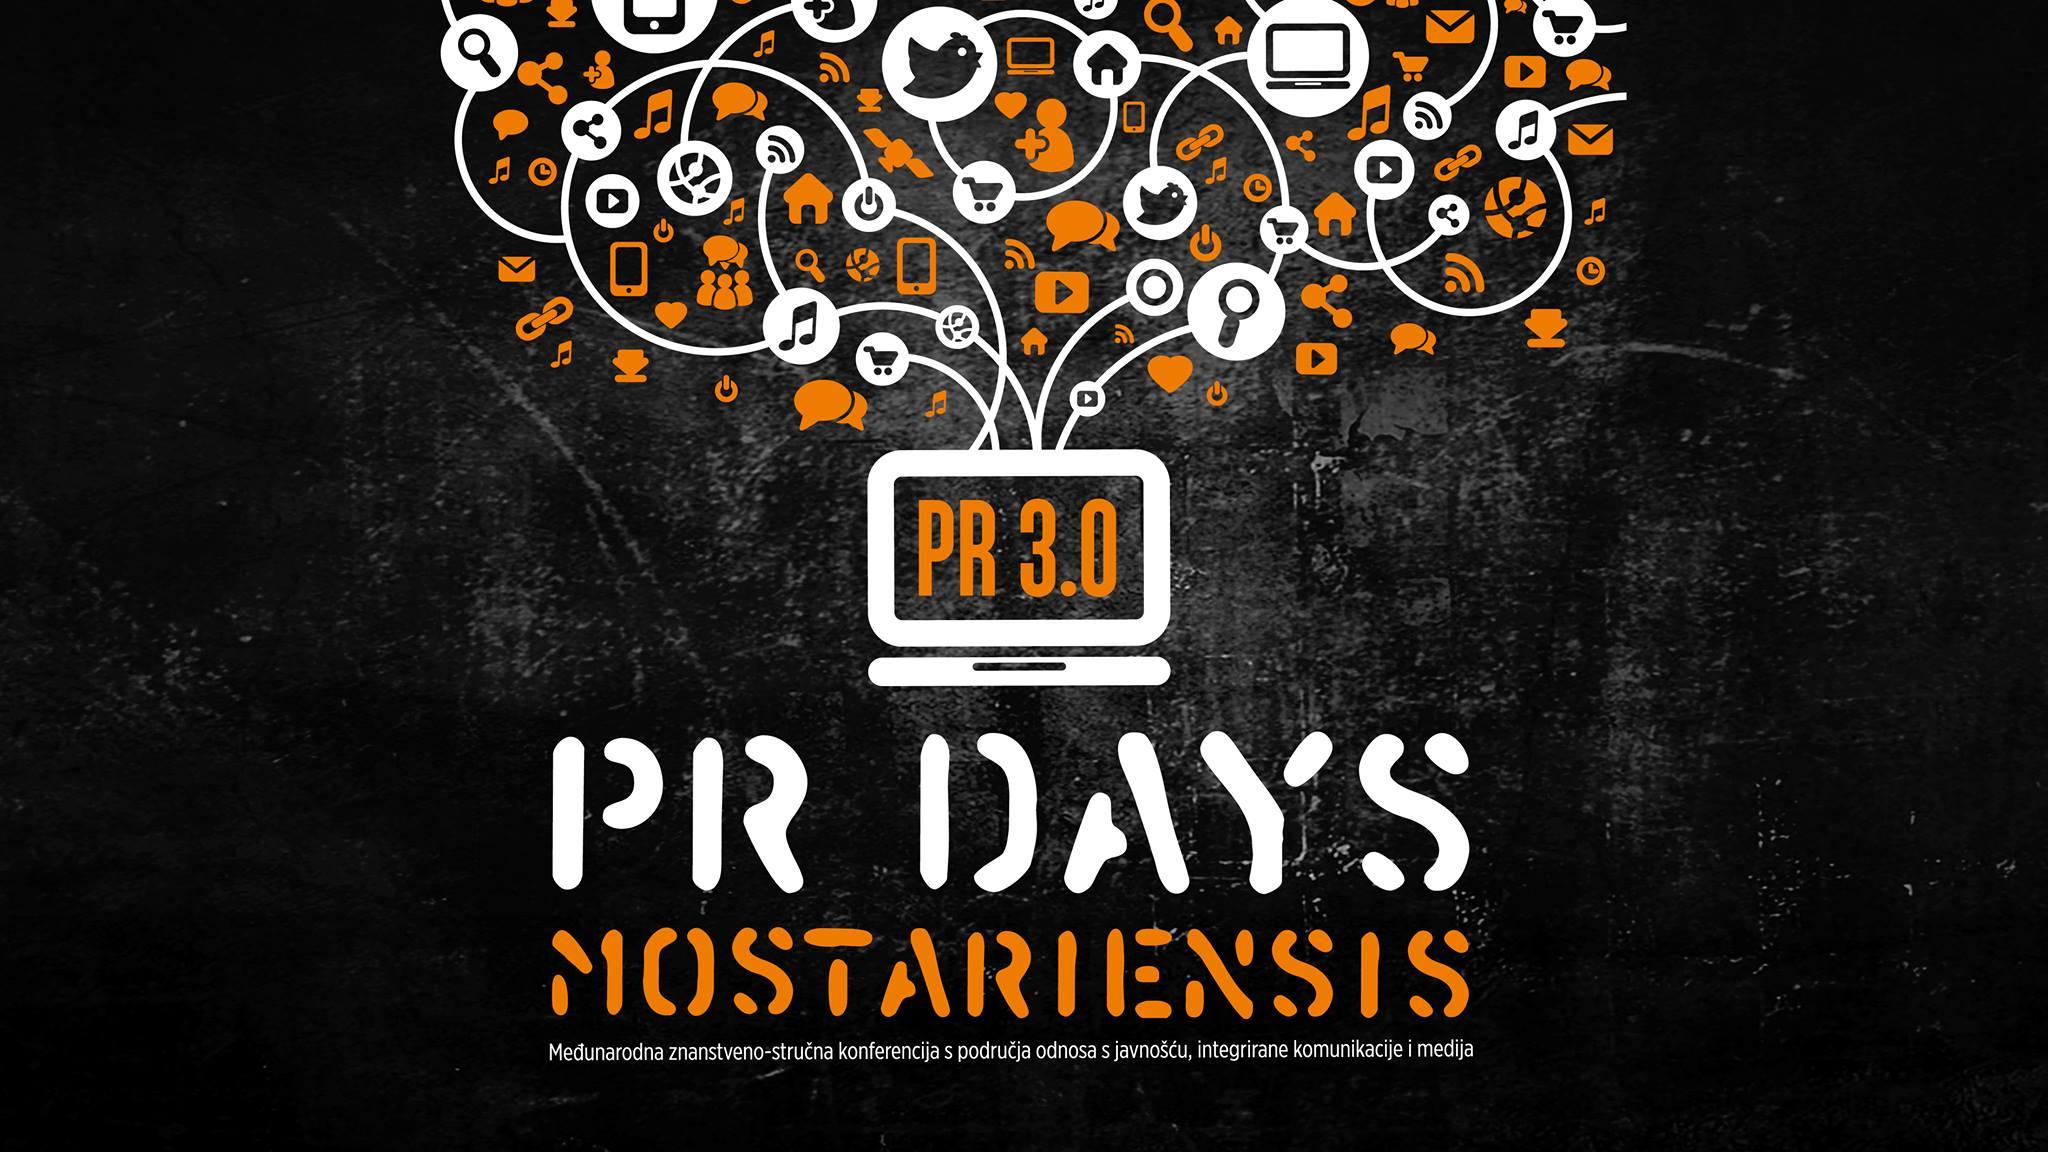 www.facebook.com prdaysmostariensis